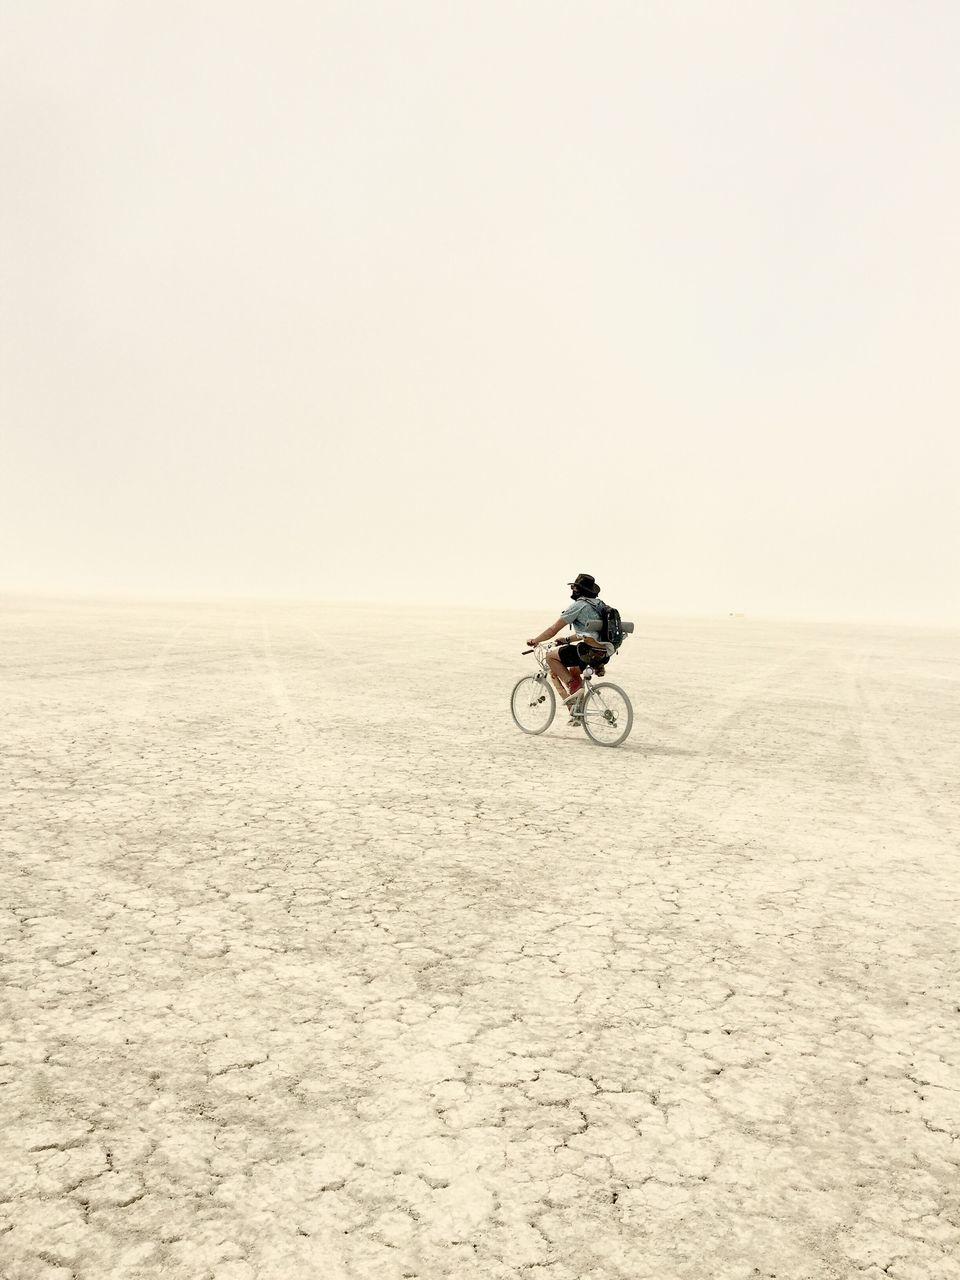 Full Length Of Man Riding Bicycle At Desert